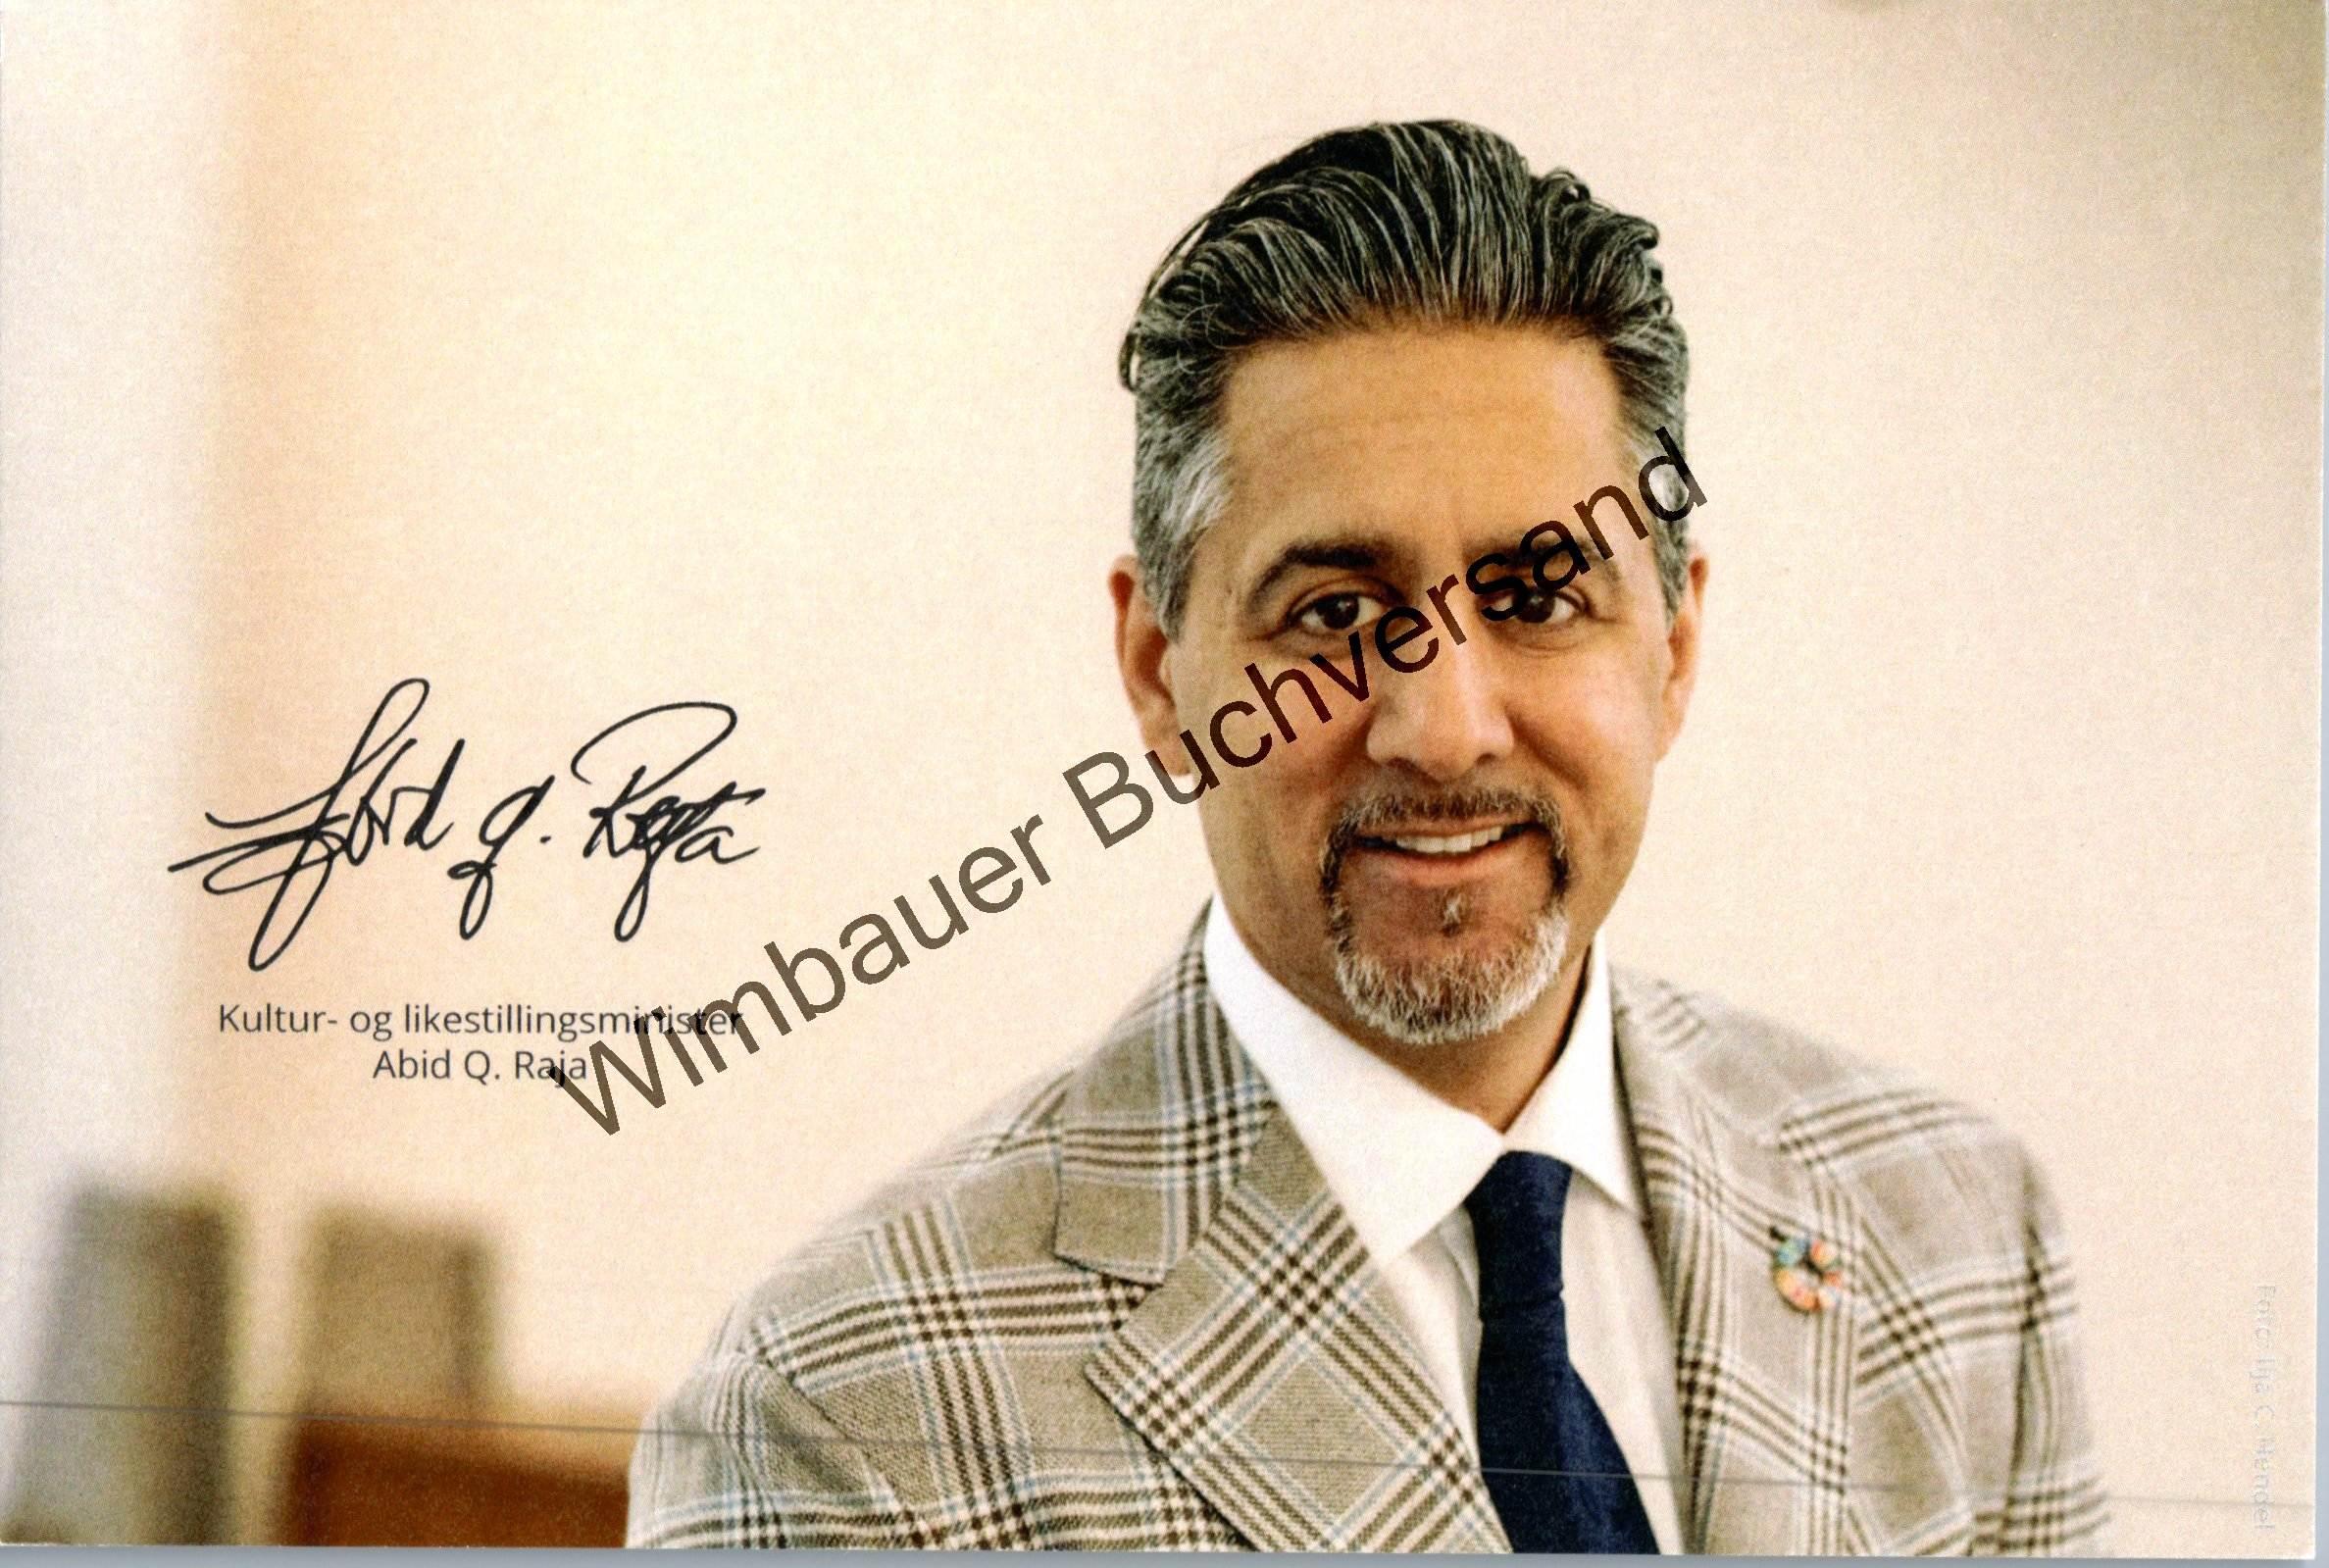 Autogrammkarte Abid Raja Kulturminister Norwegen /// Autogramm Autograph signiert signed signee